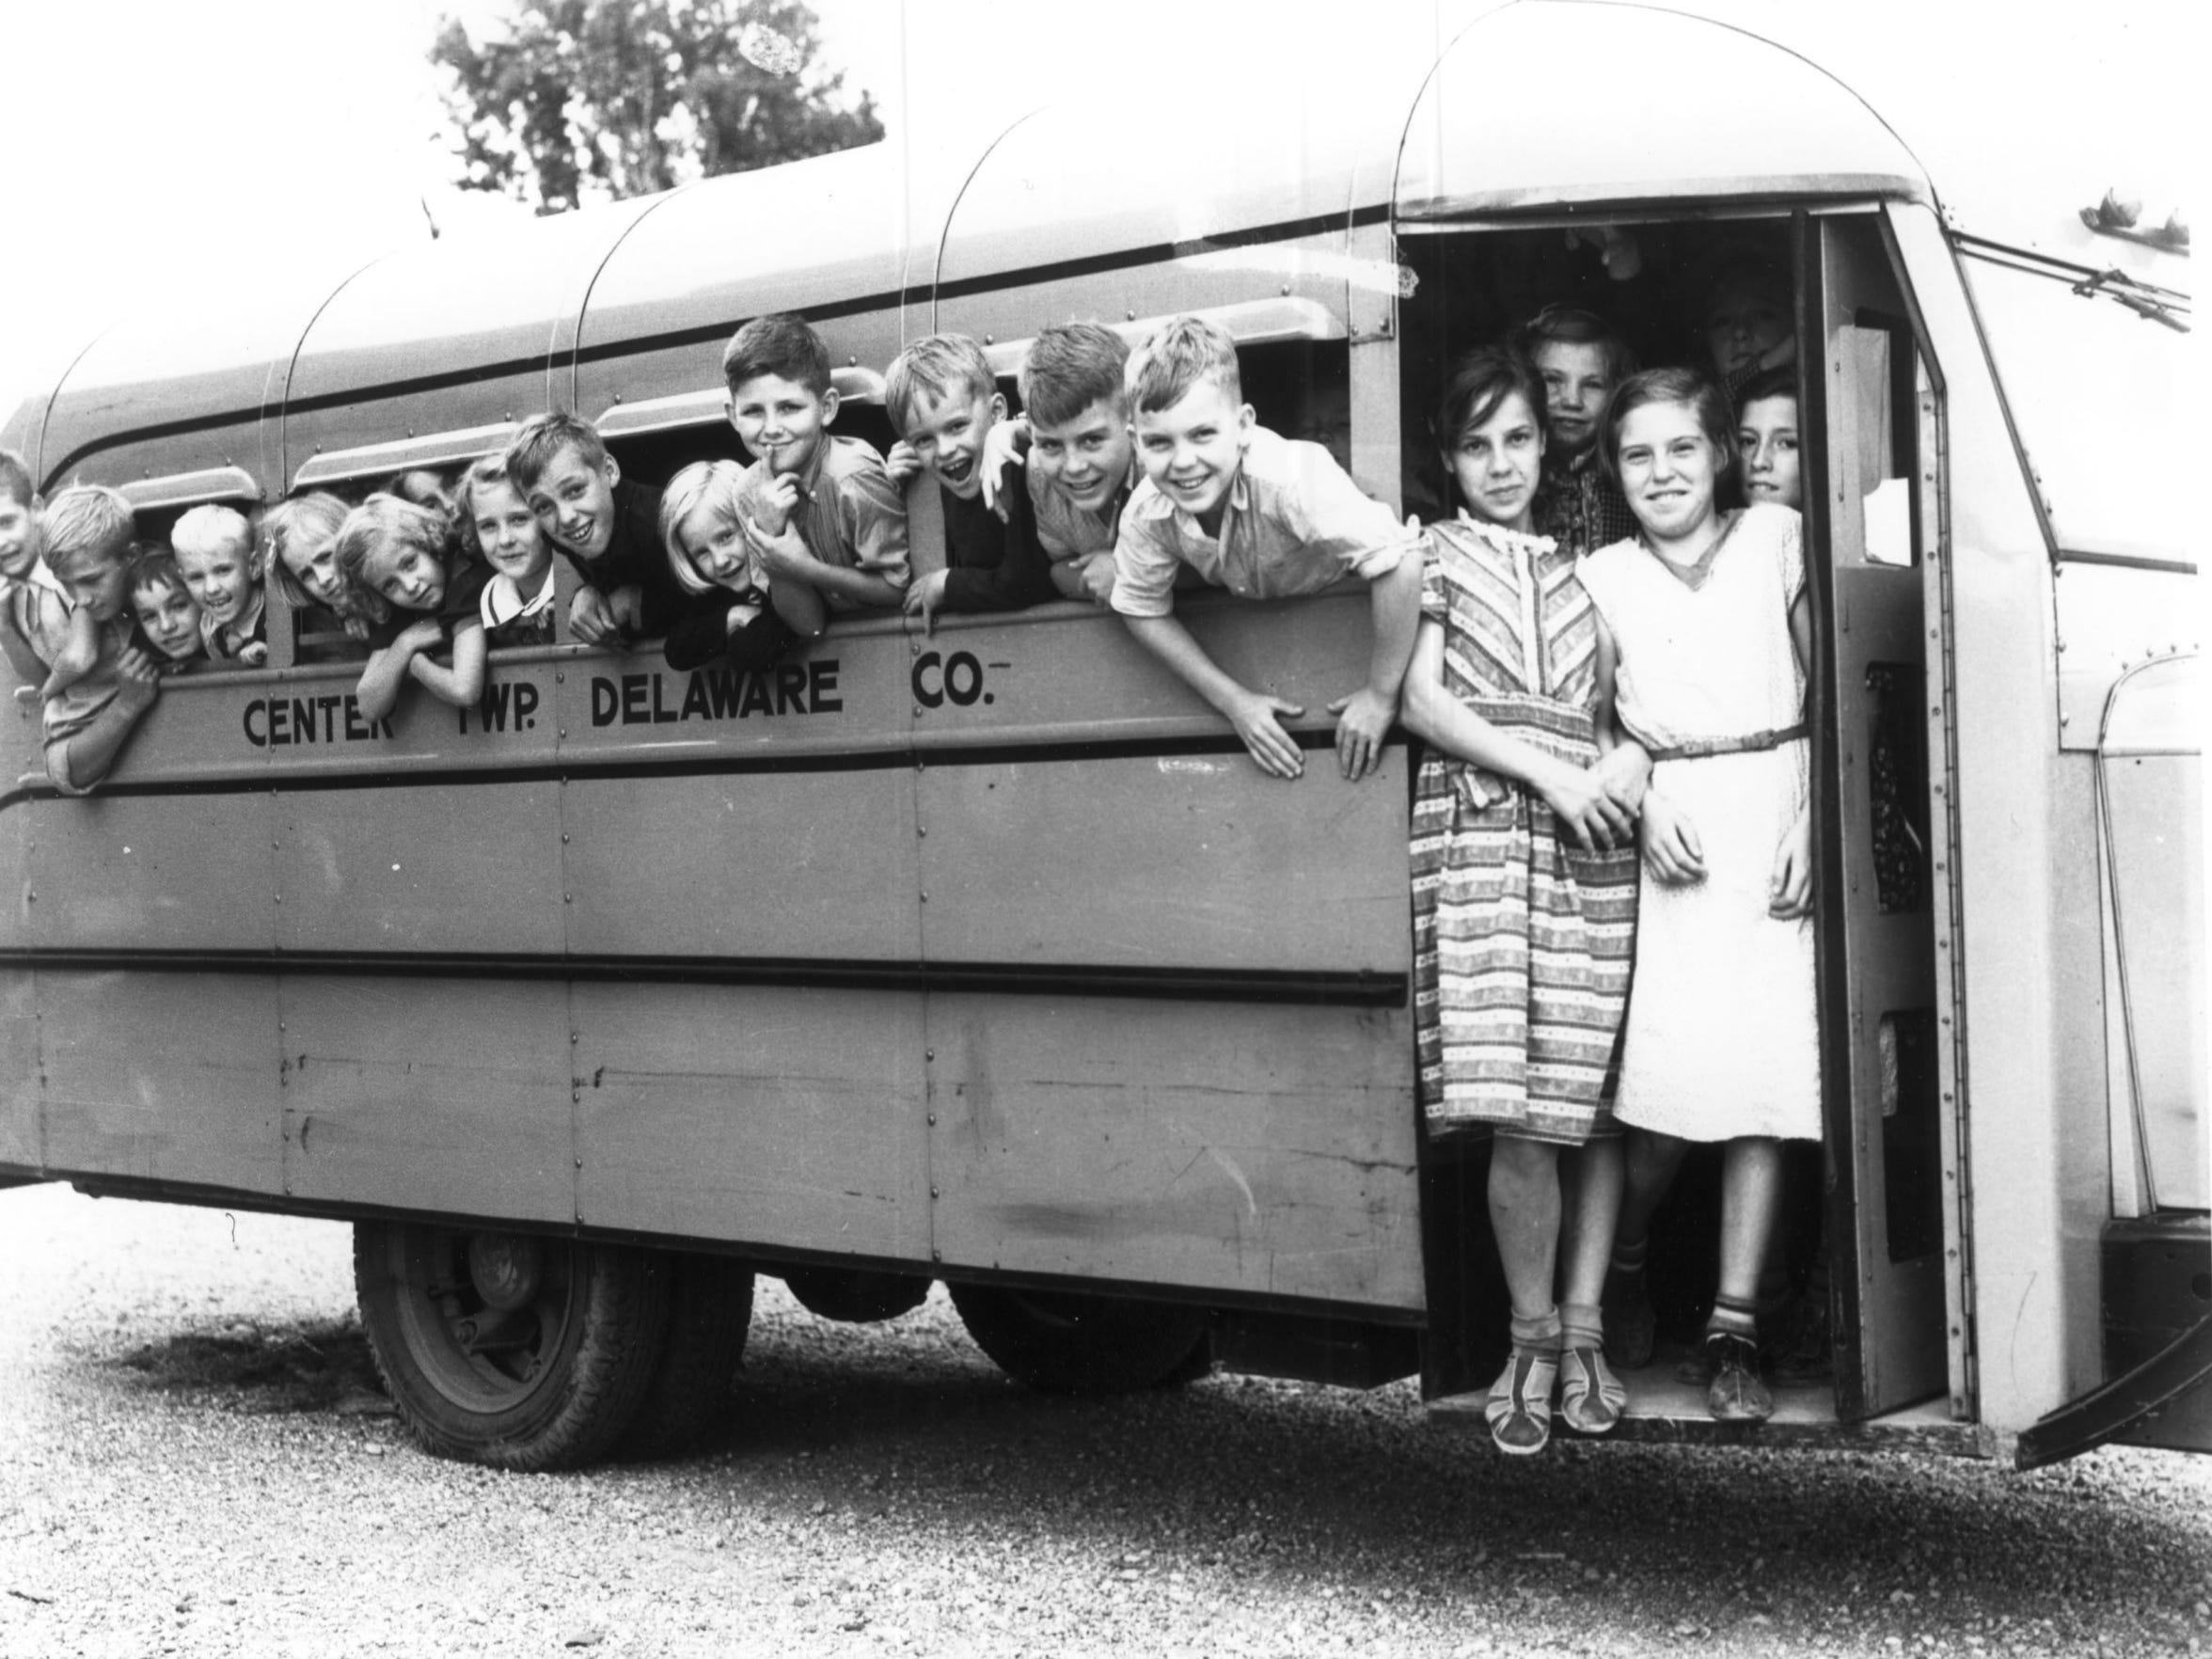 Center Schools school bus